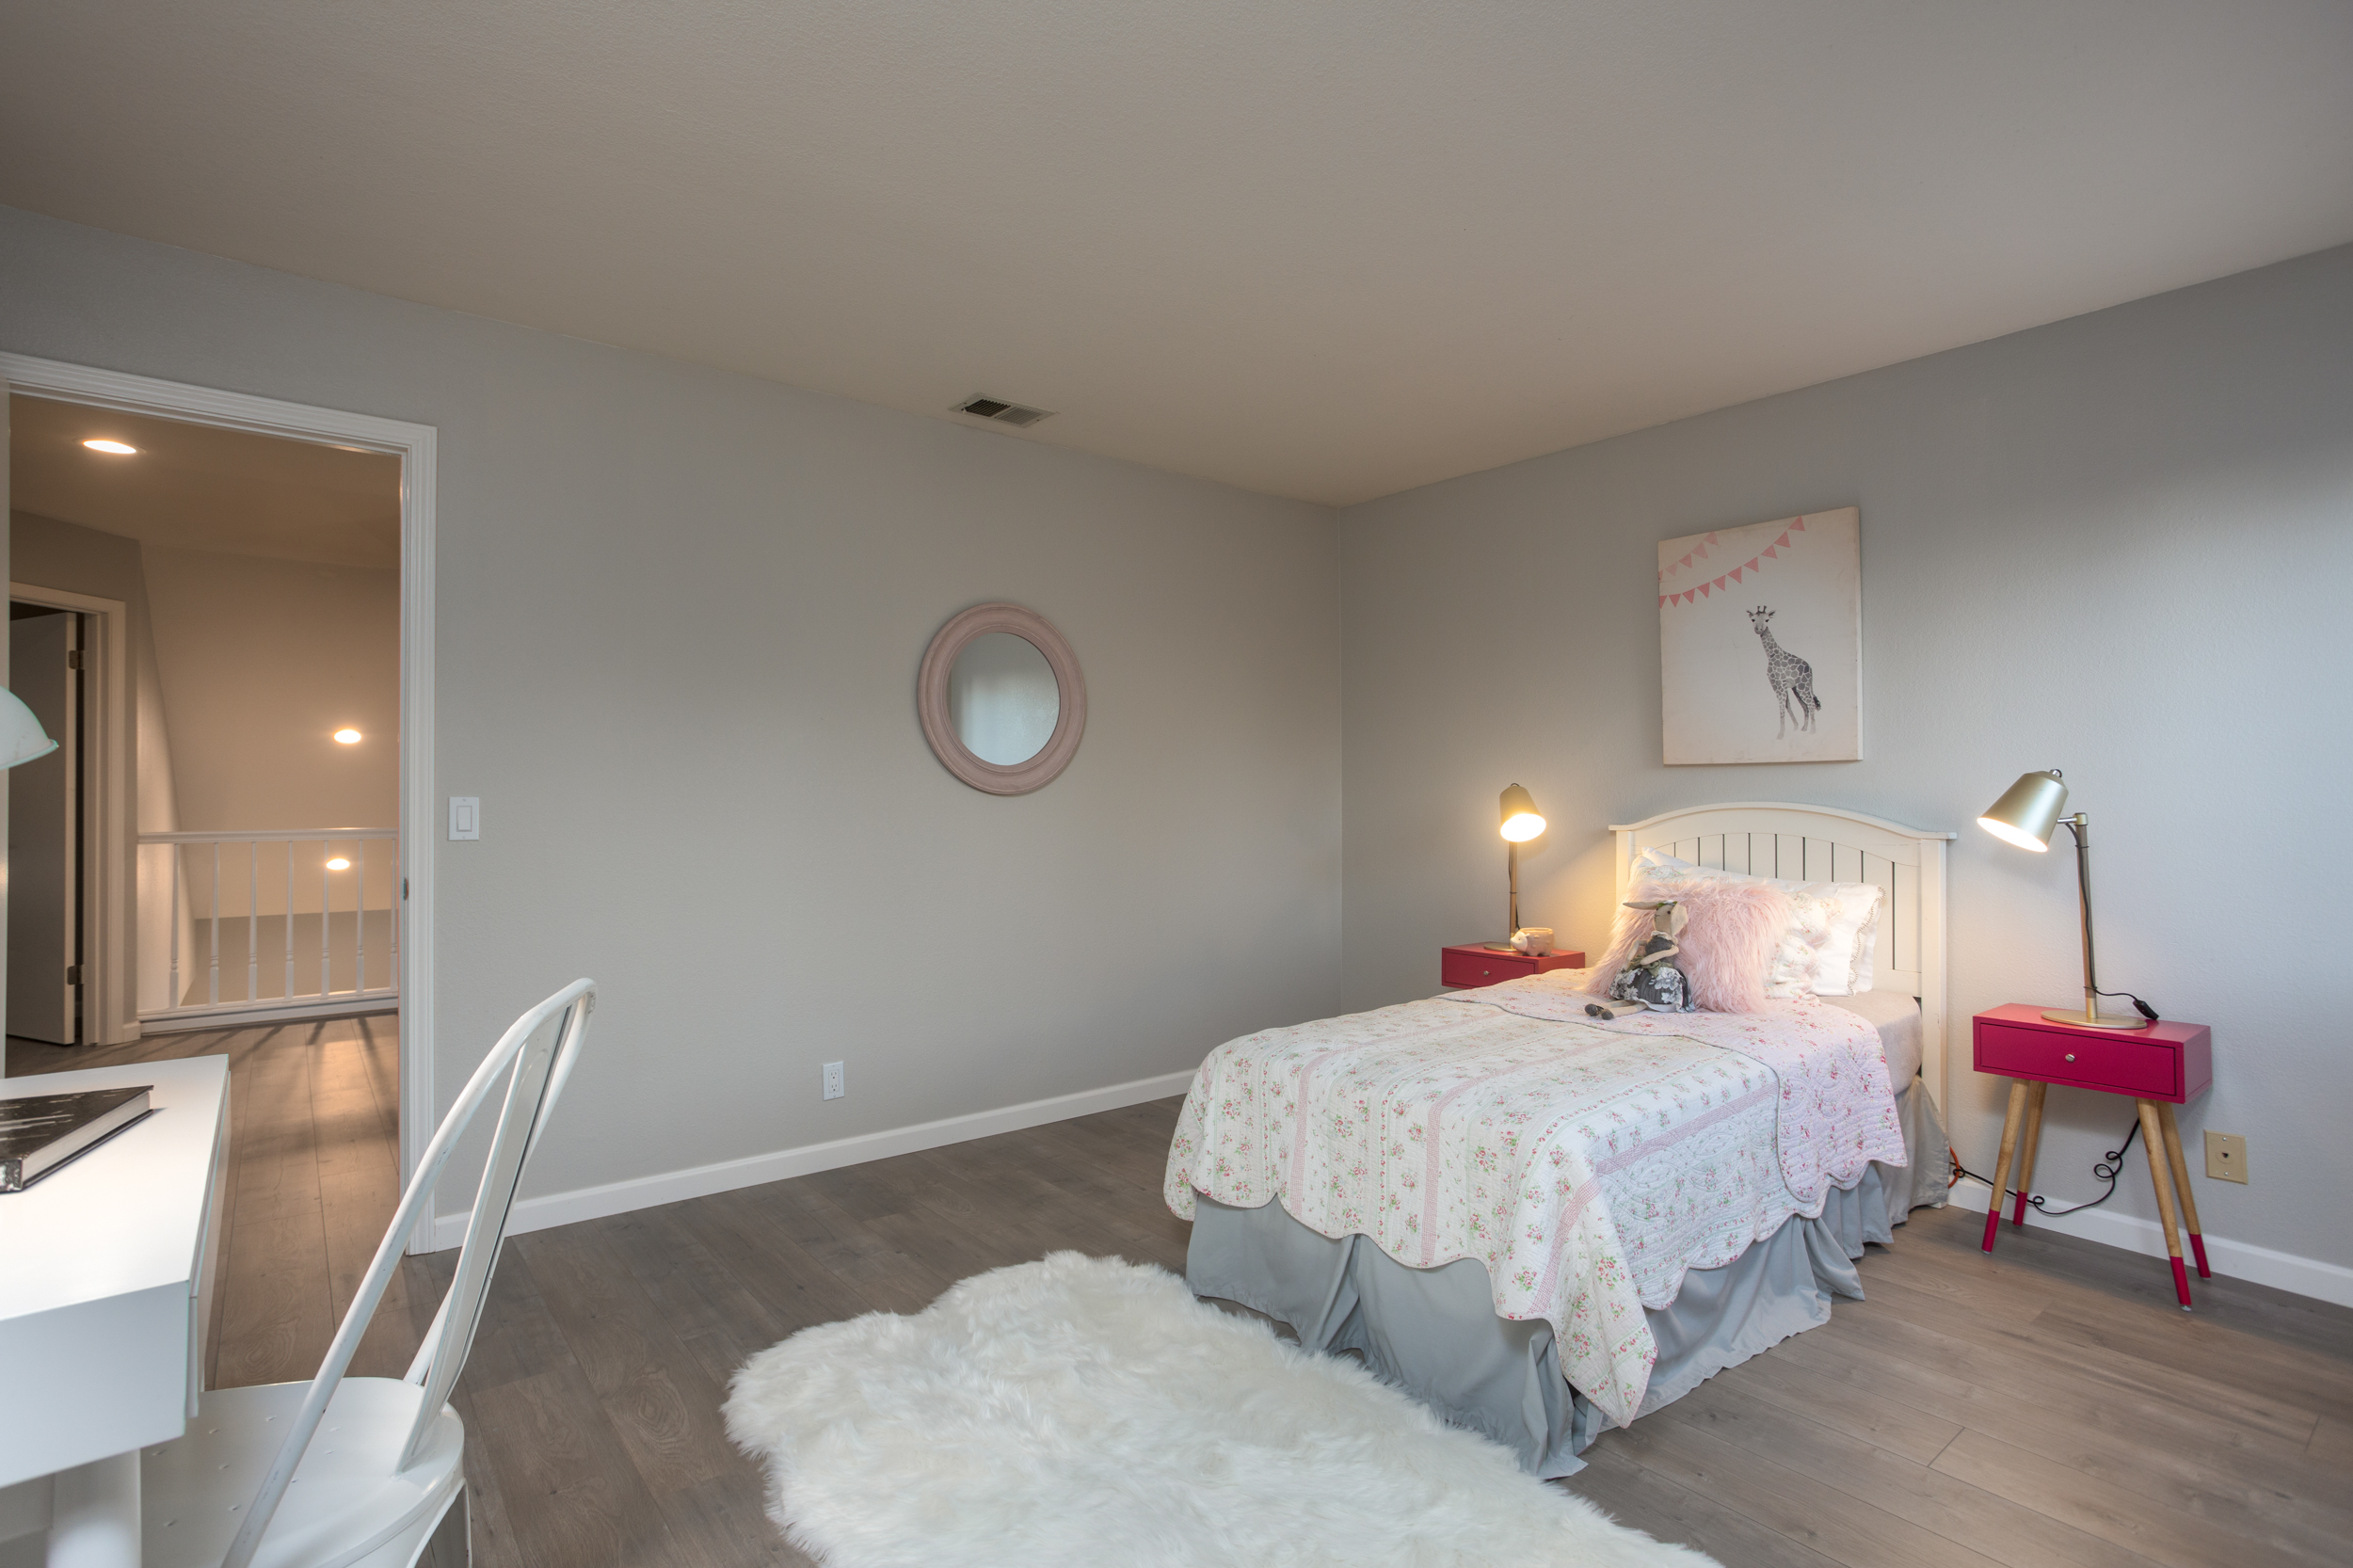 28 Bedroom.jpg